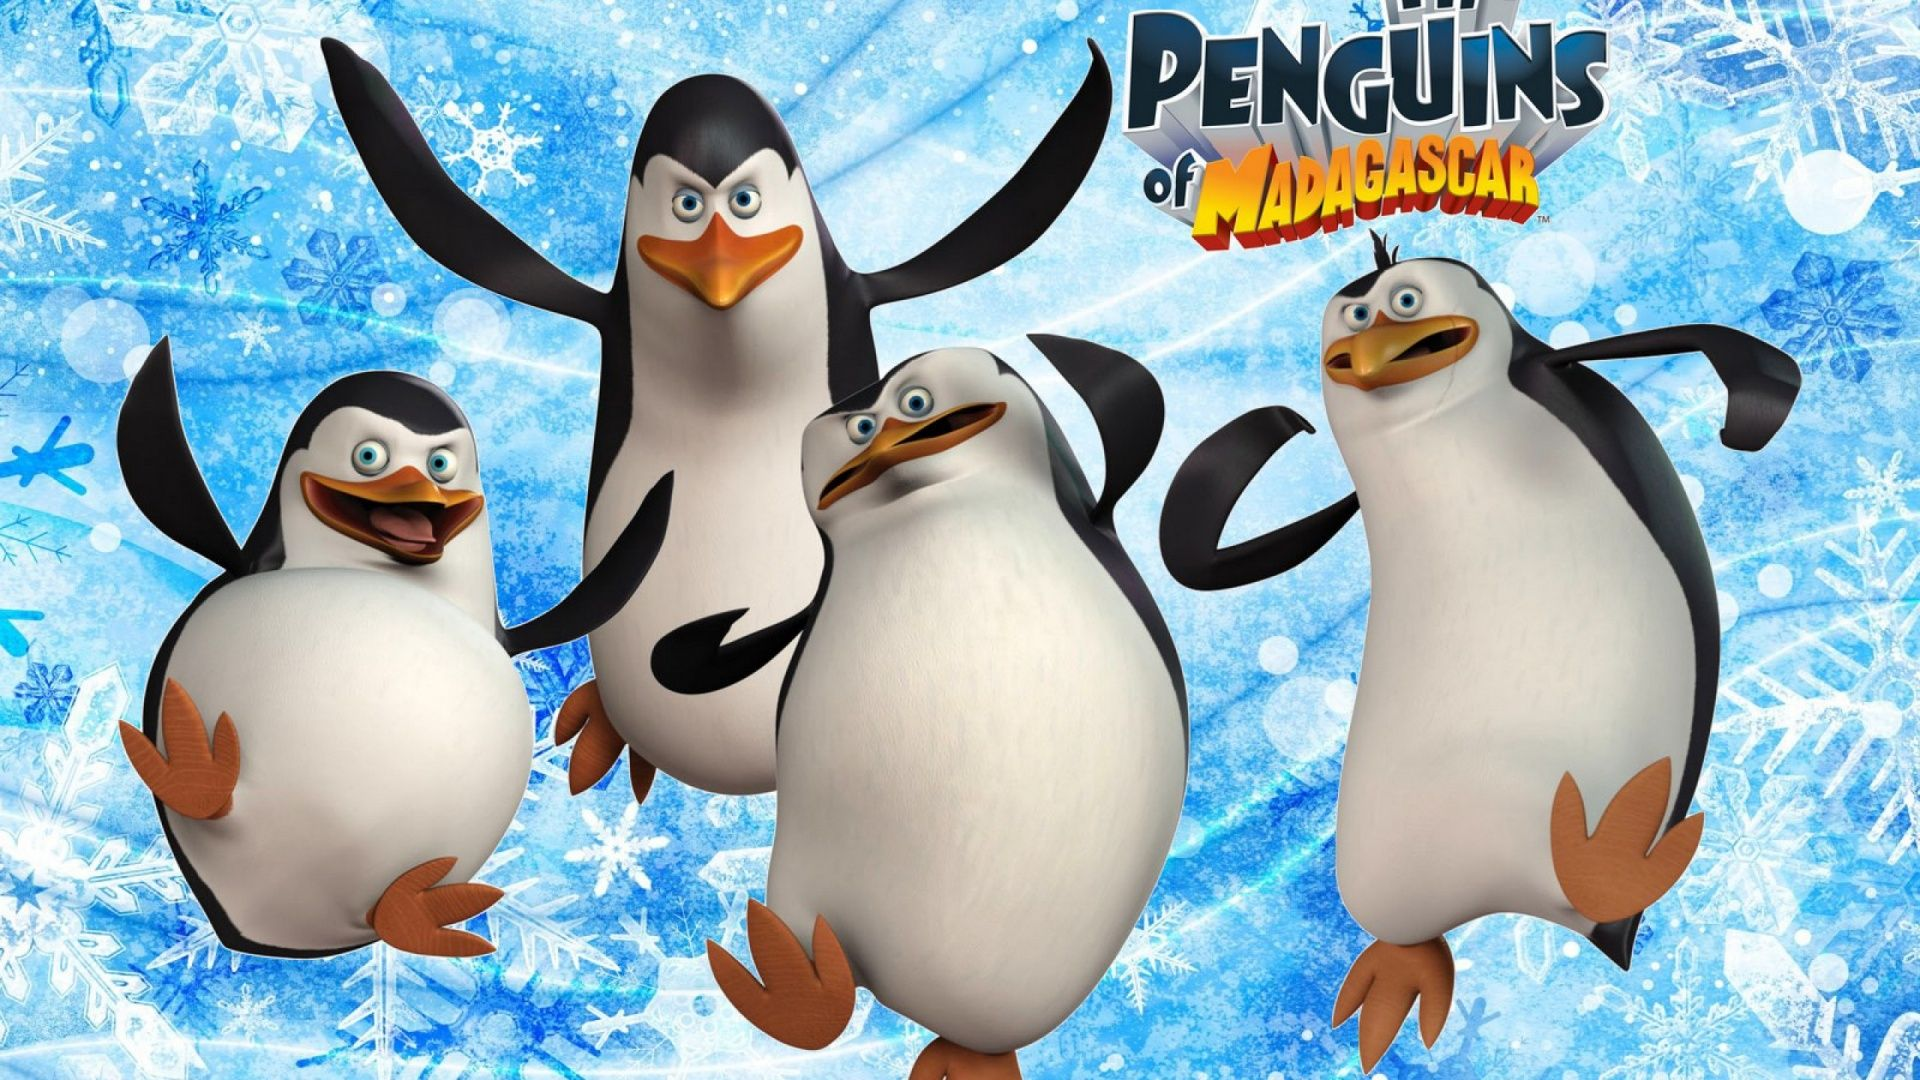 Penguins Of Madagascar 2014 Penguins Of Madagascar Penguins Madagascar Movie